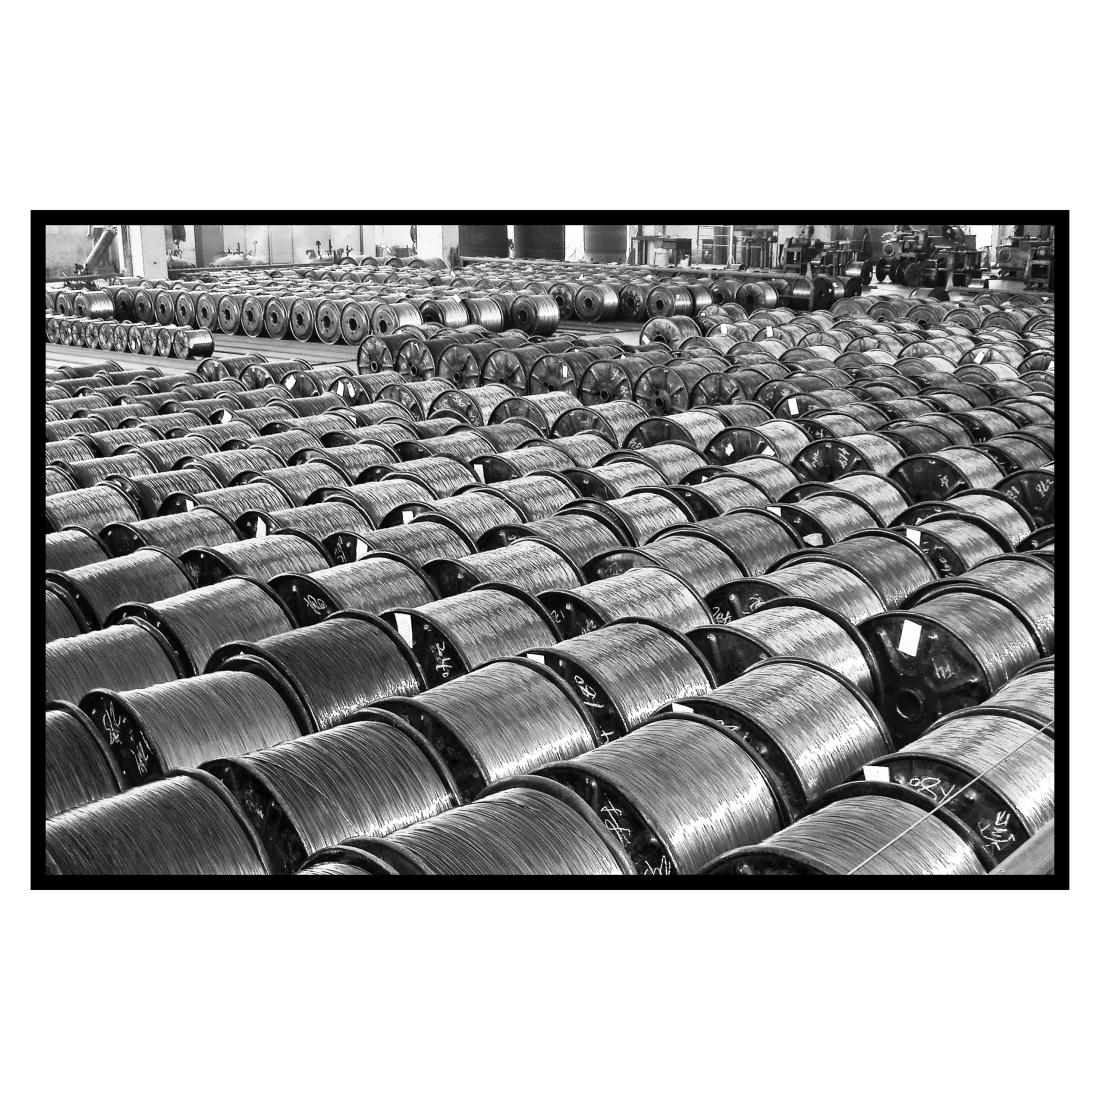 Copper reels. Wuxi, China.